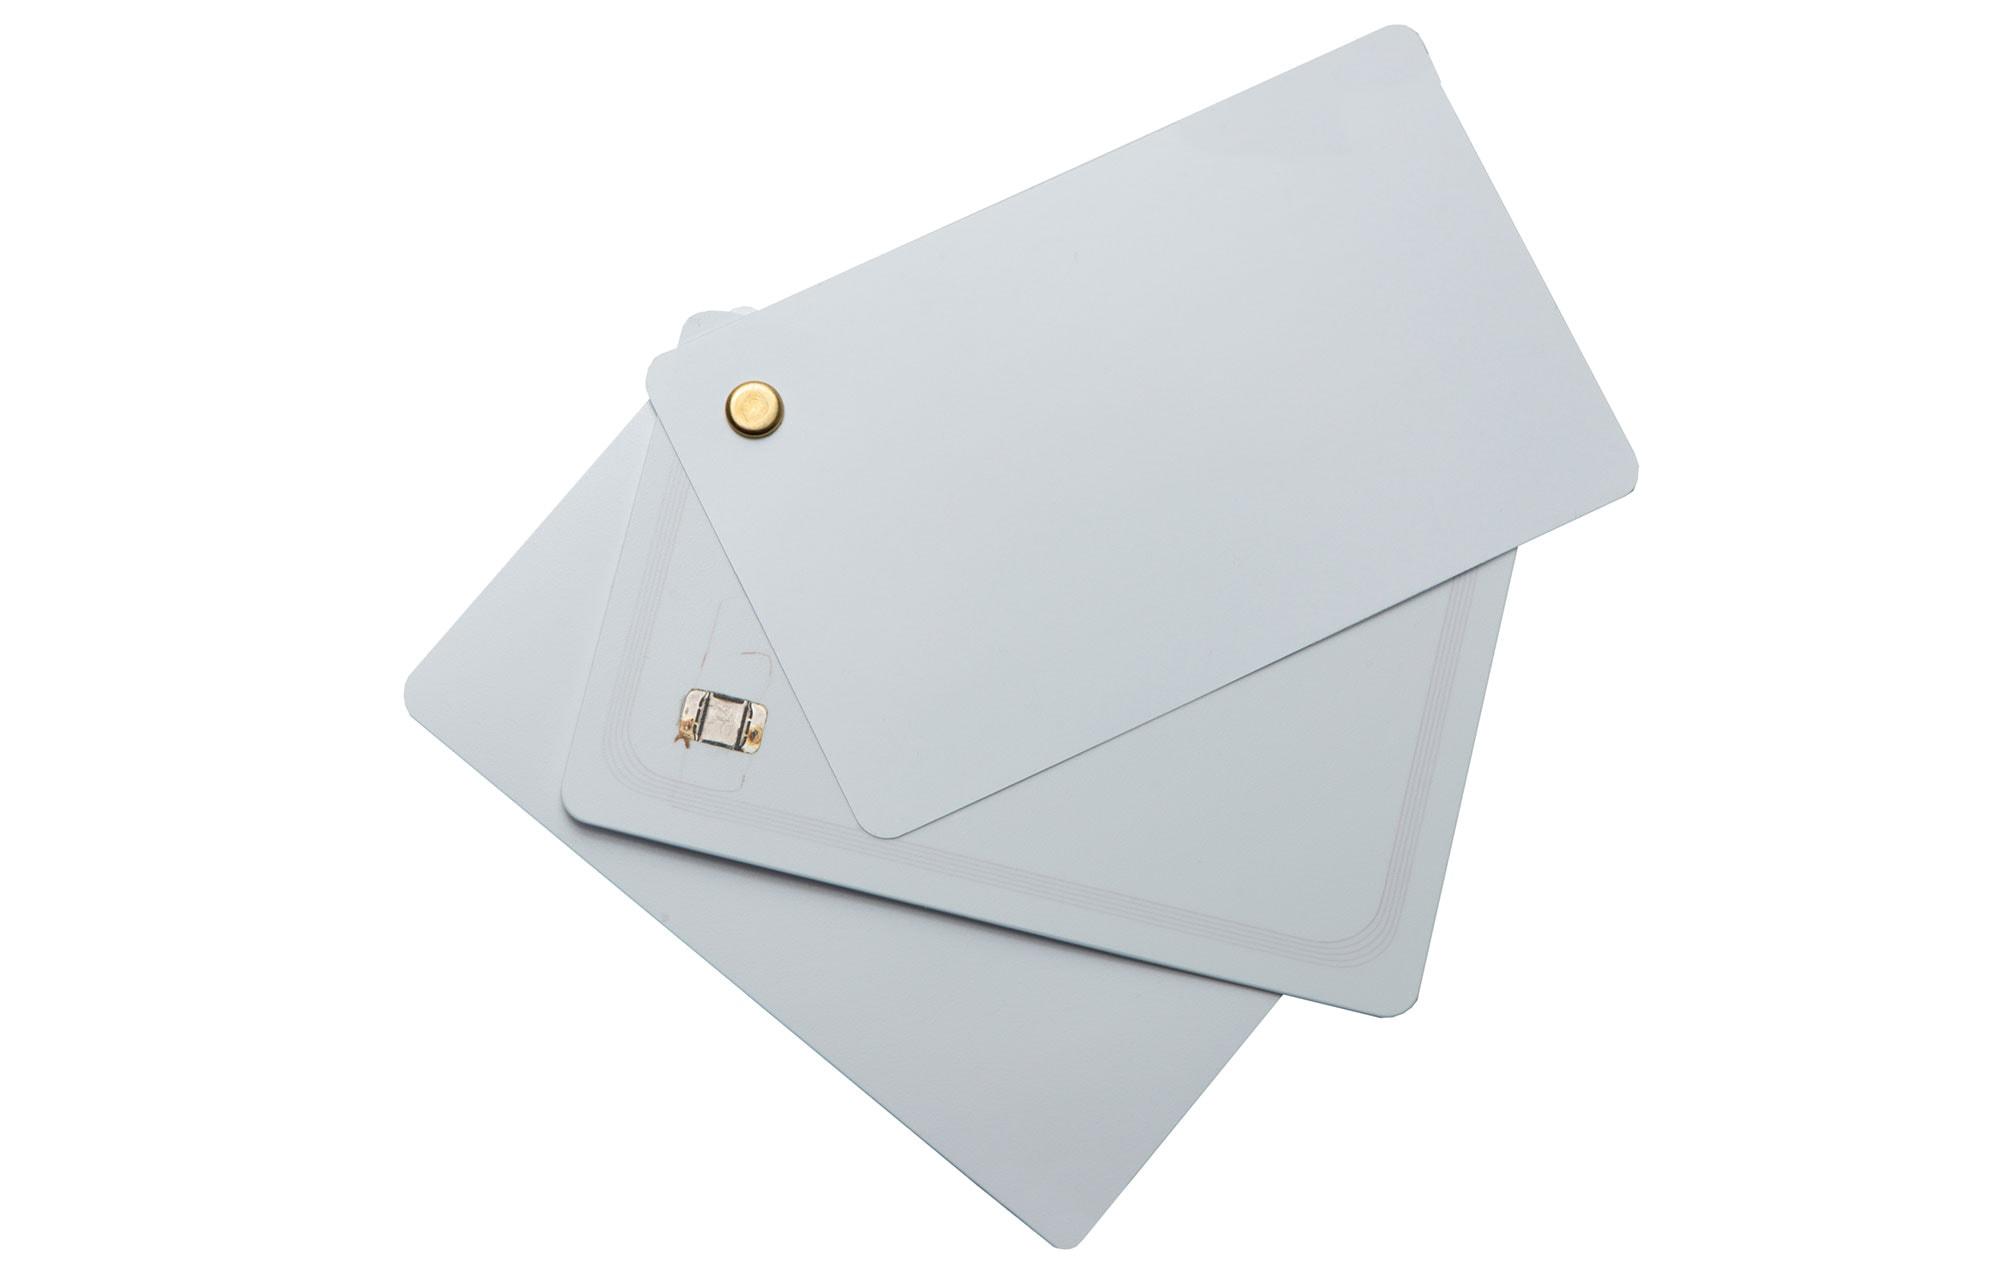 RFID-Karten, NFC-Karten - exceet Card Group - Kartensortiment